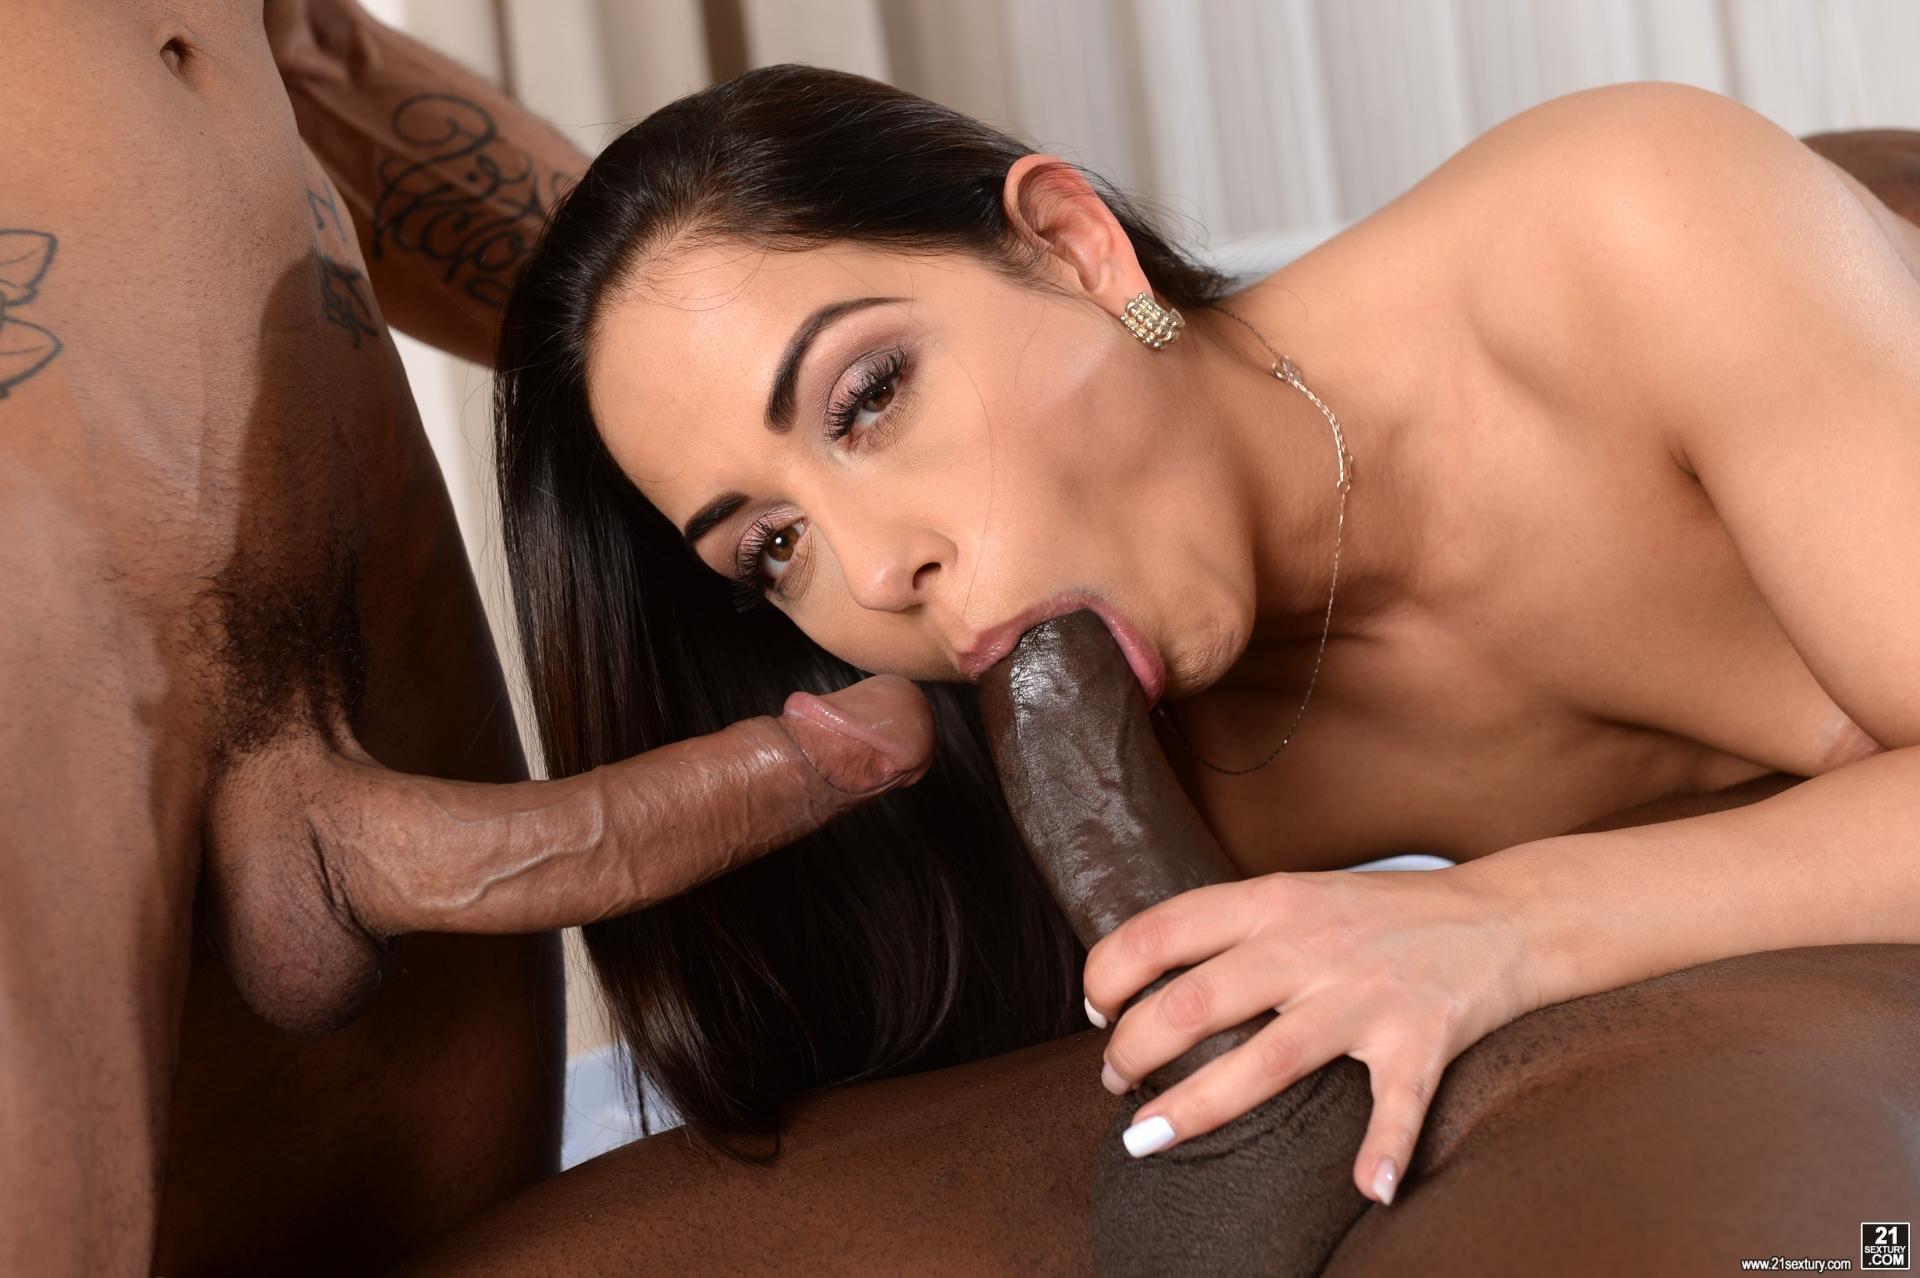 Free porn images of katreena kaif